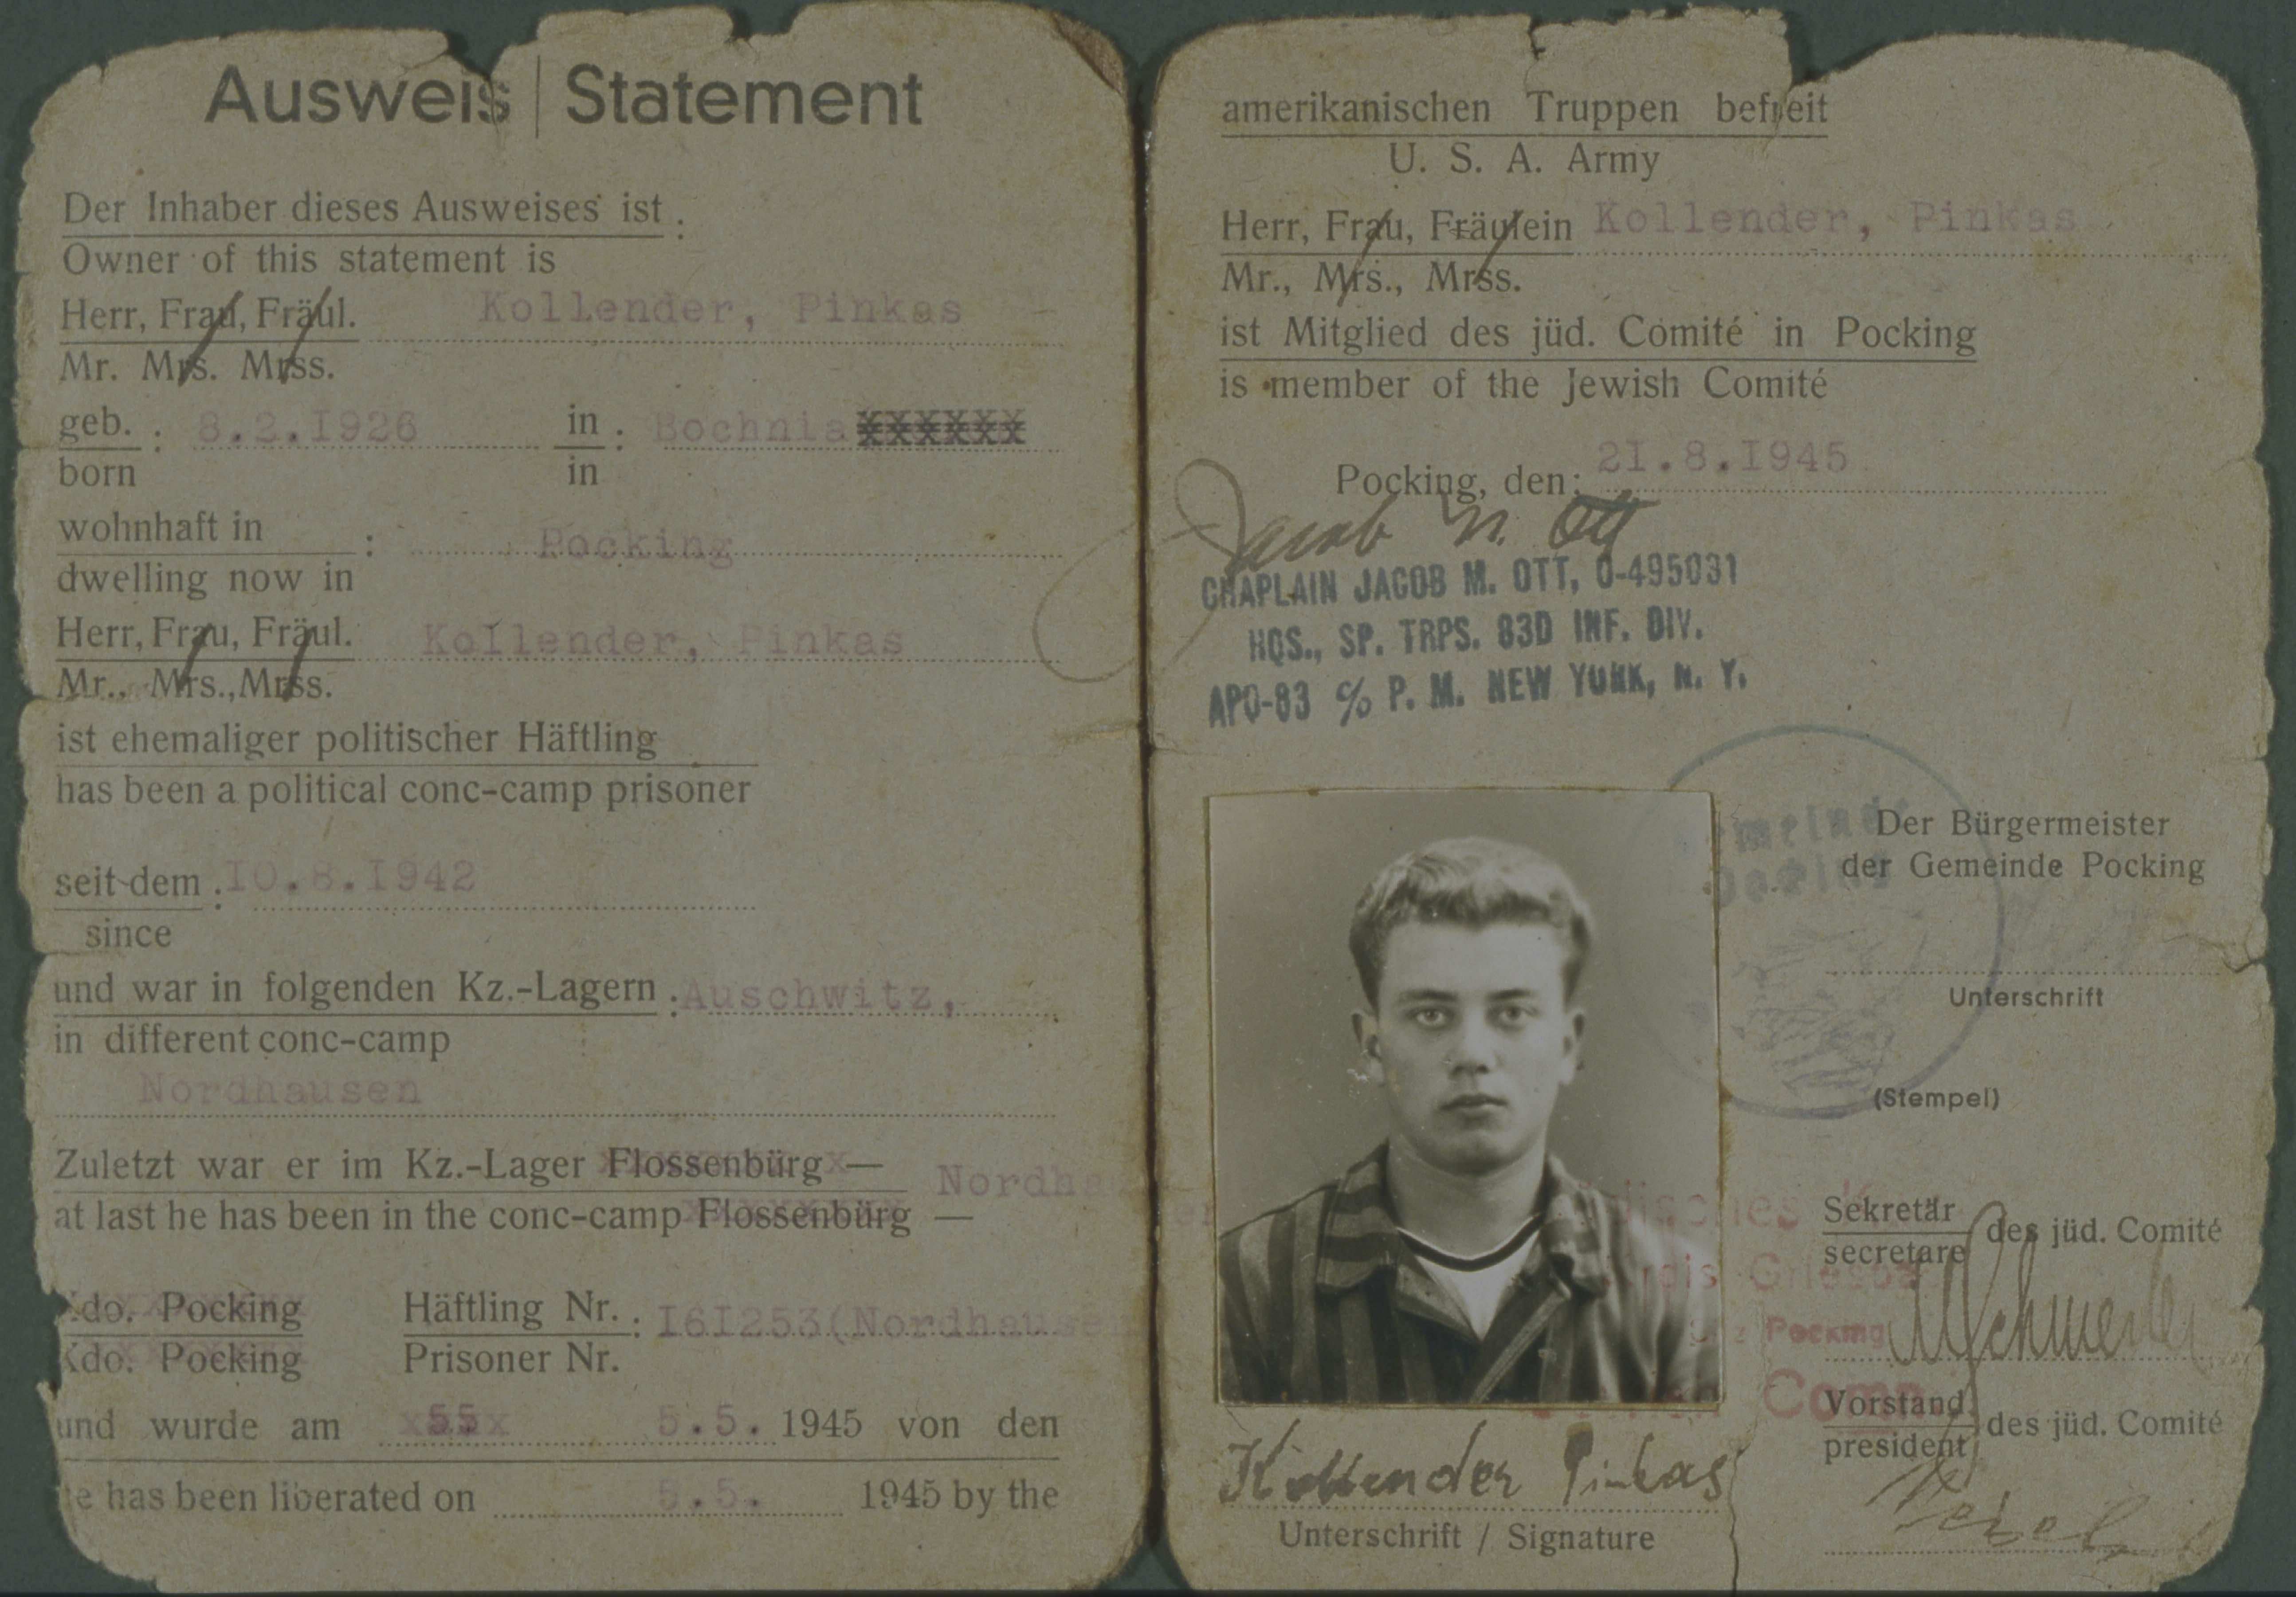 Pincus Kolender - Identification card